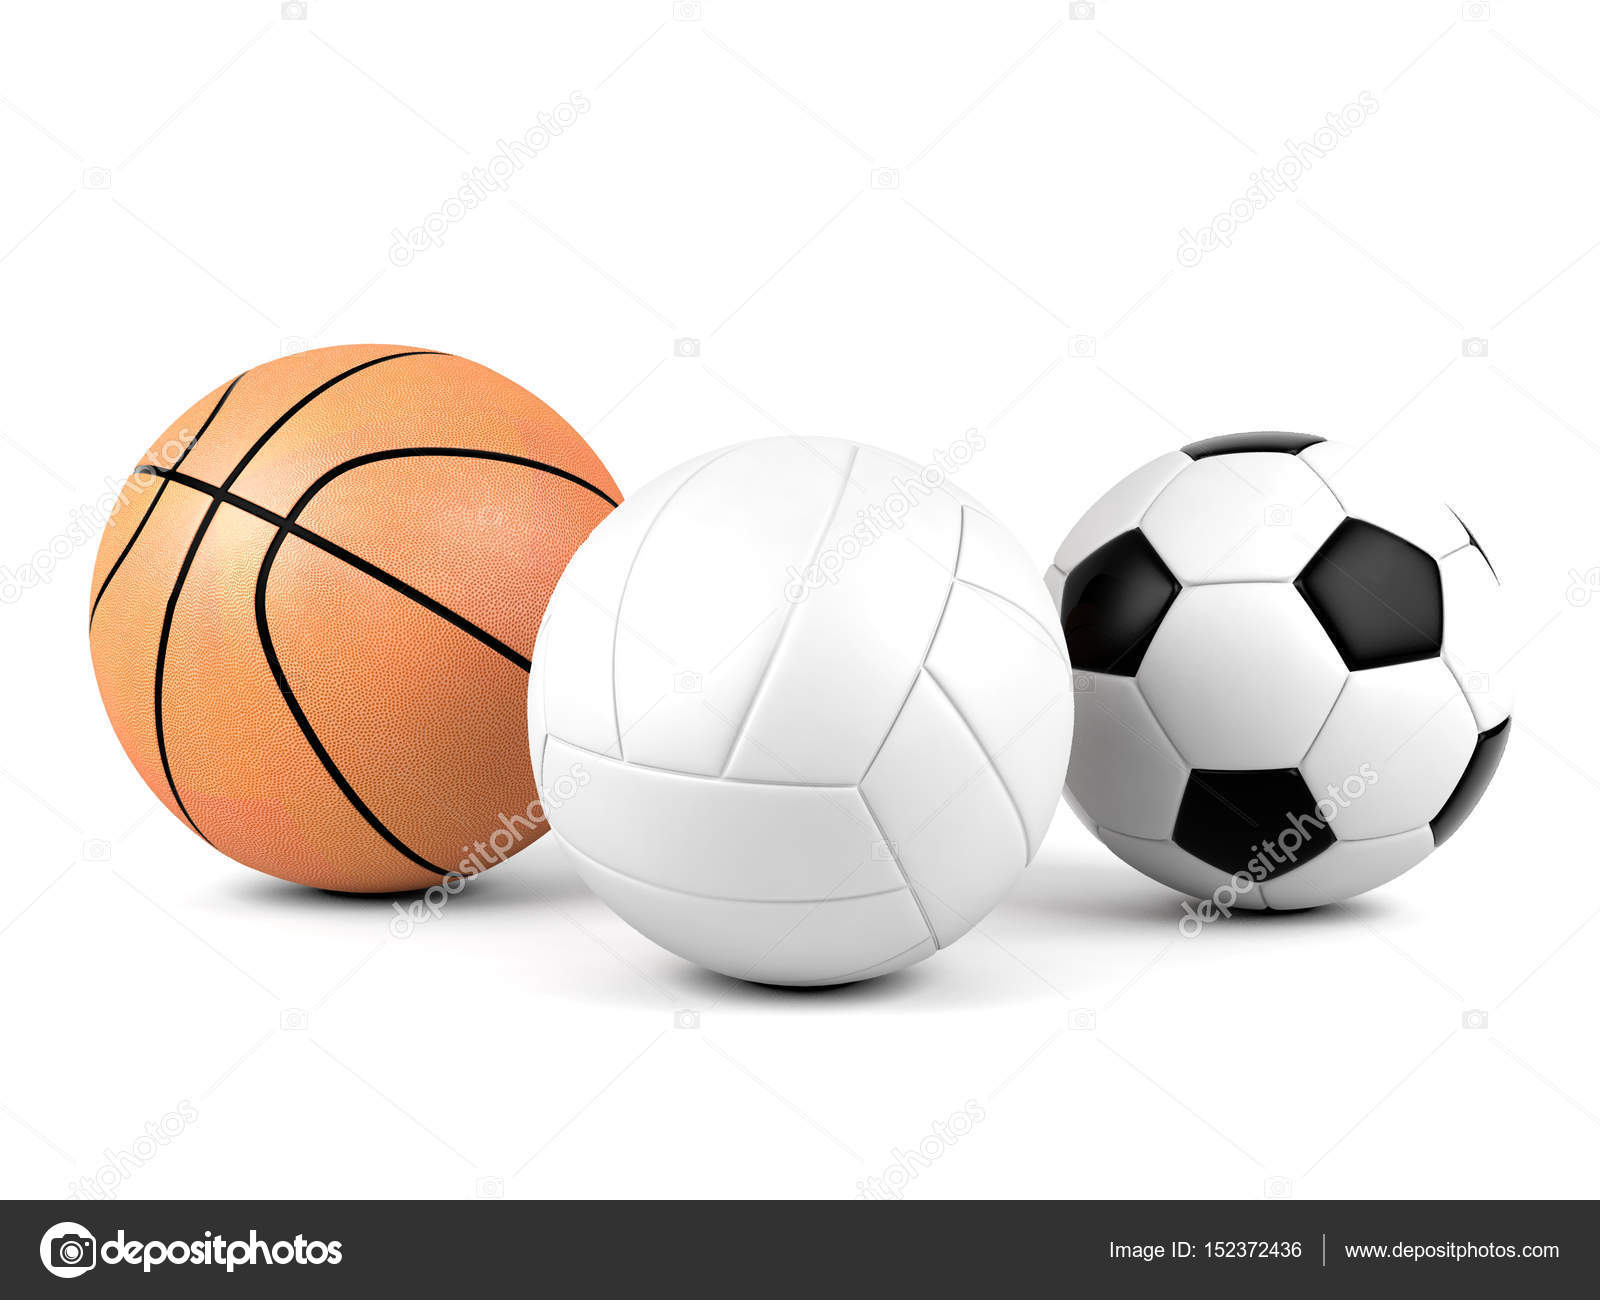 Fondos De Pantalla Fútbol Pelota Silueta Deporte: Imagenes De Balones De Baloncesto